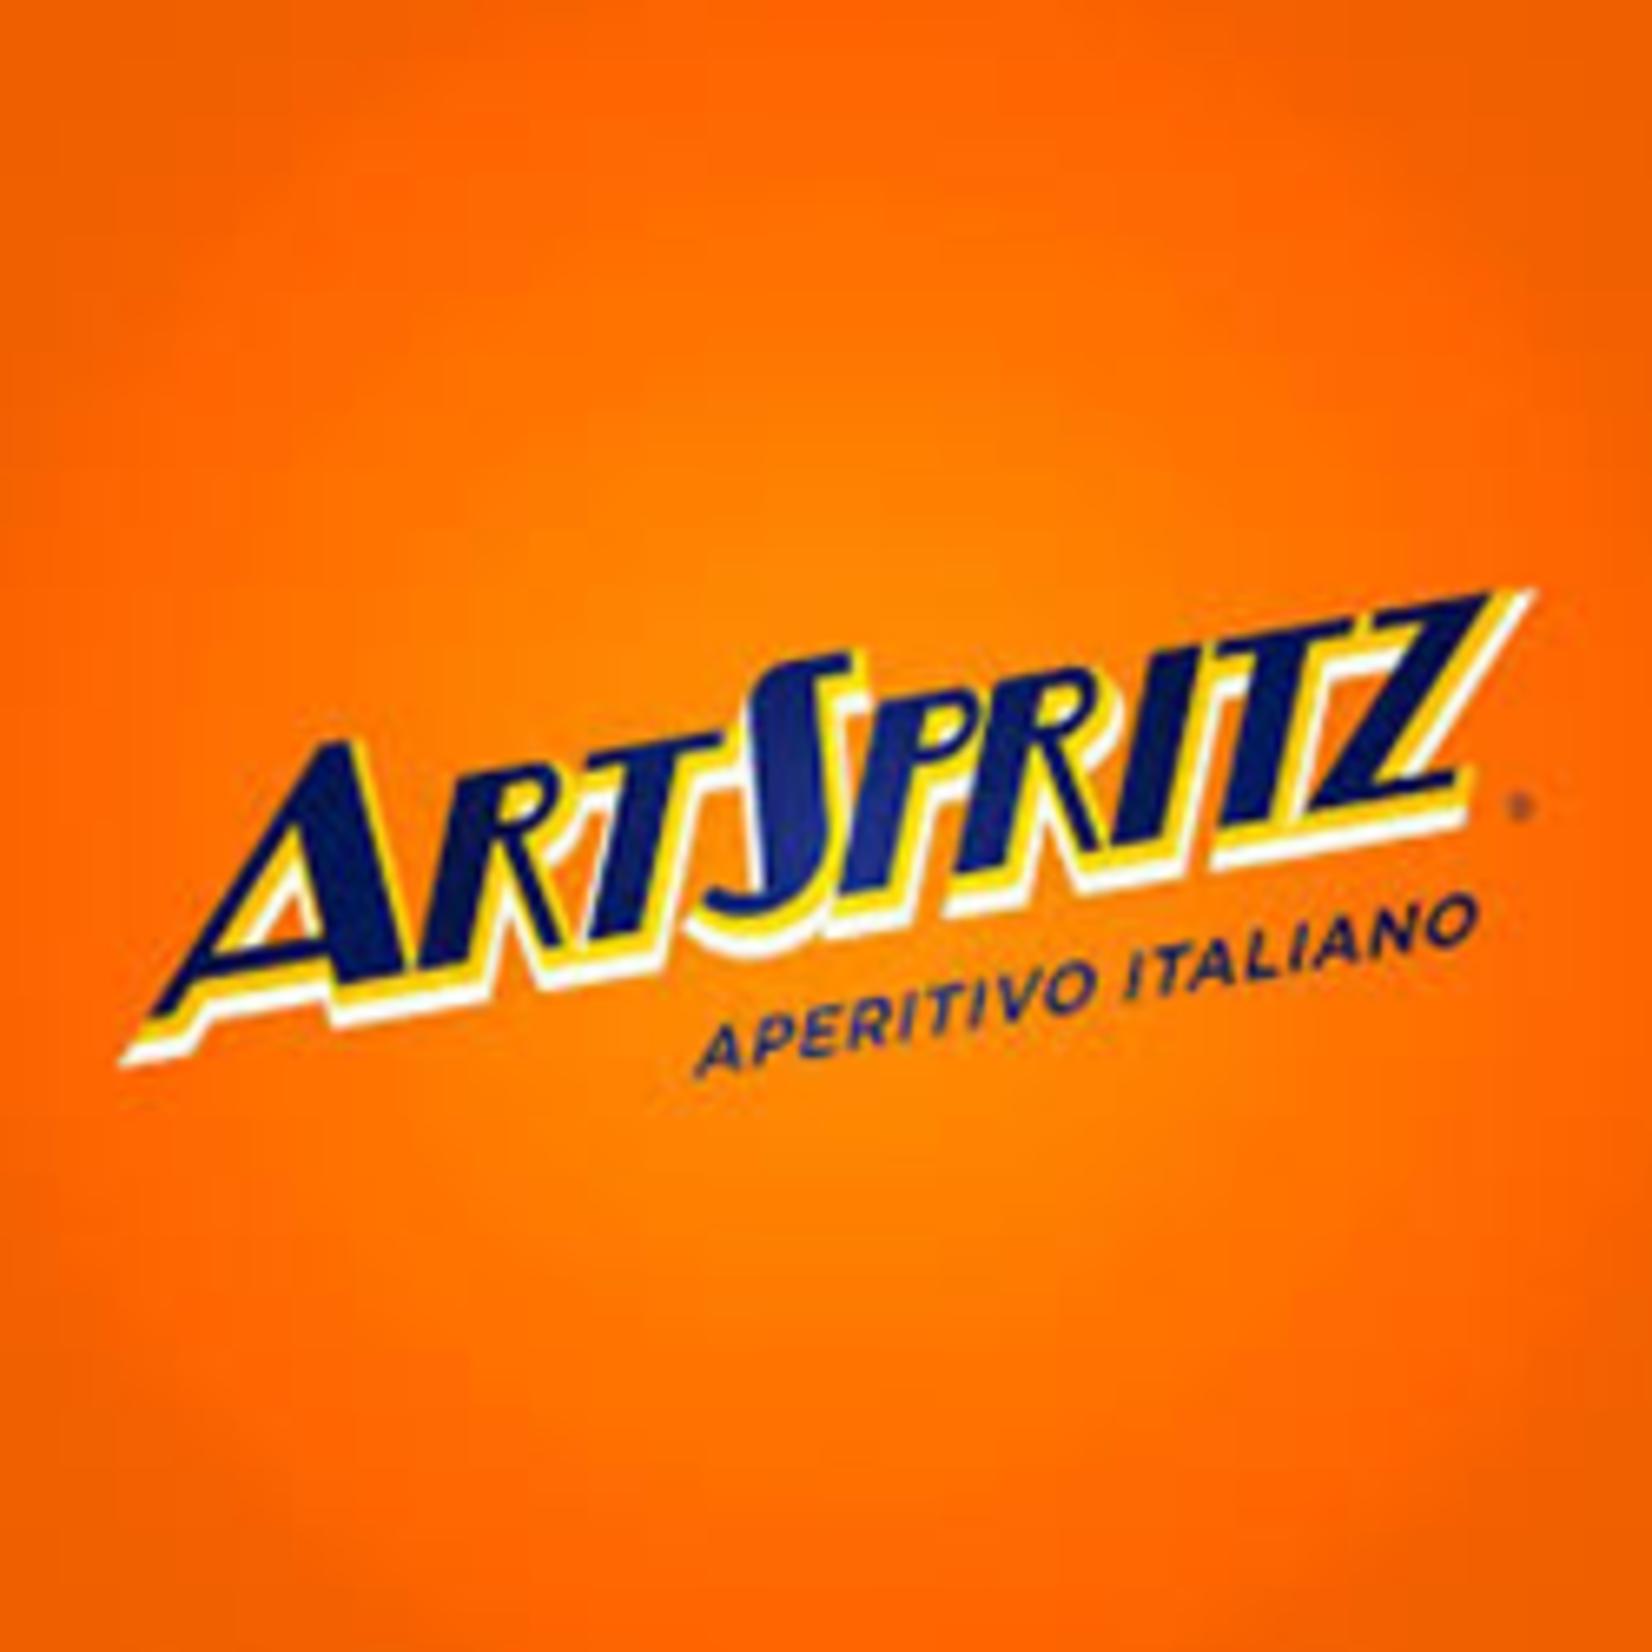 ArtSpritz Aperol Spritz in a Can 250ml